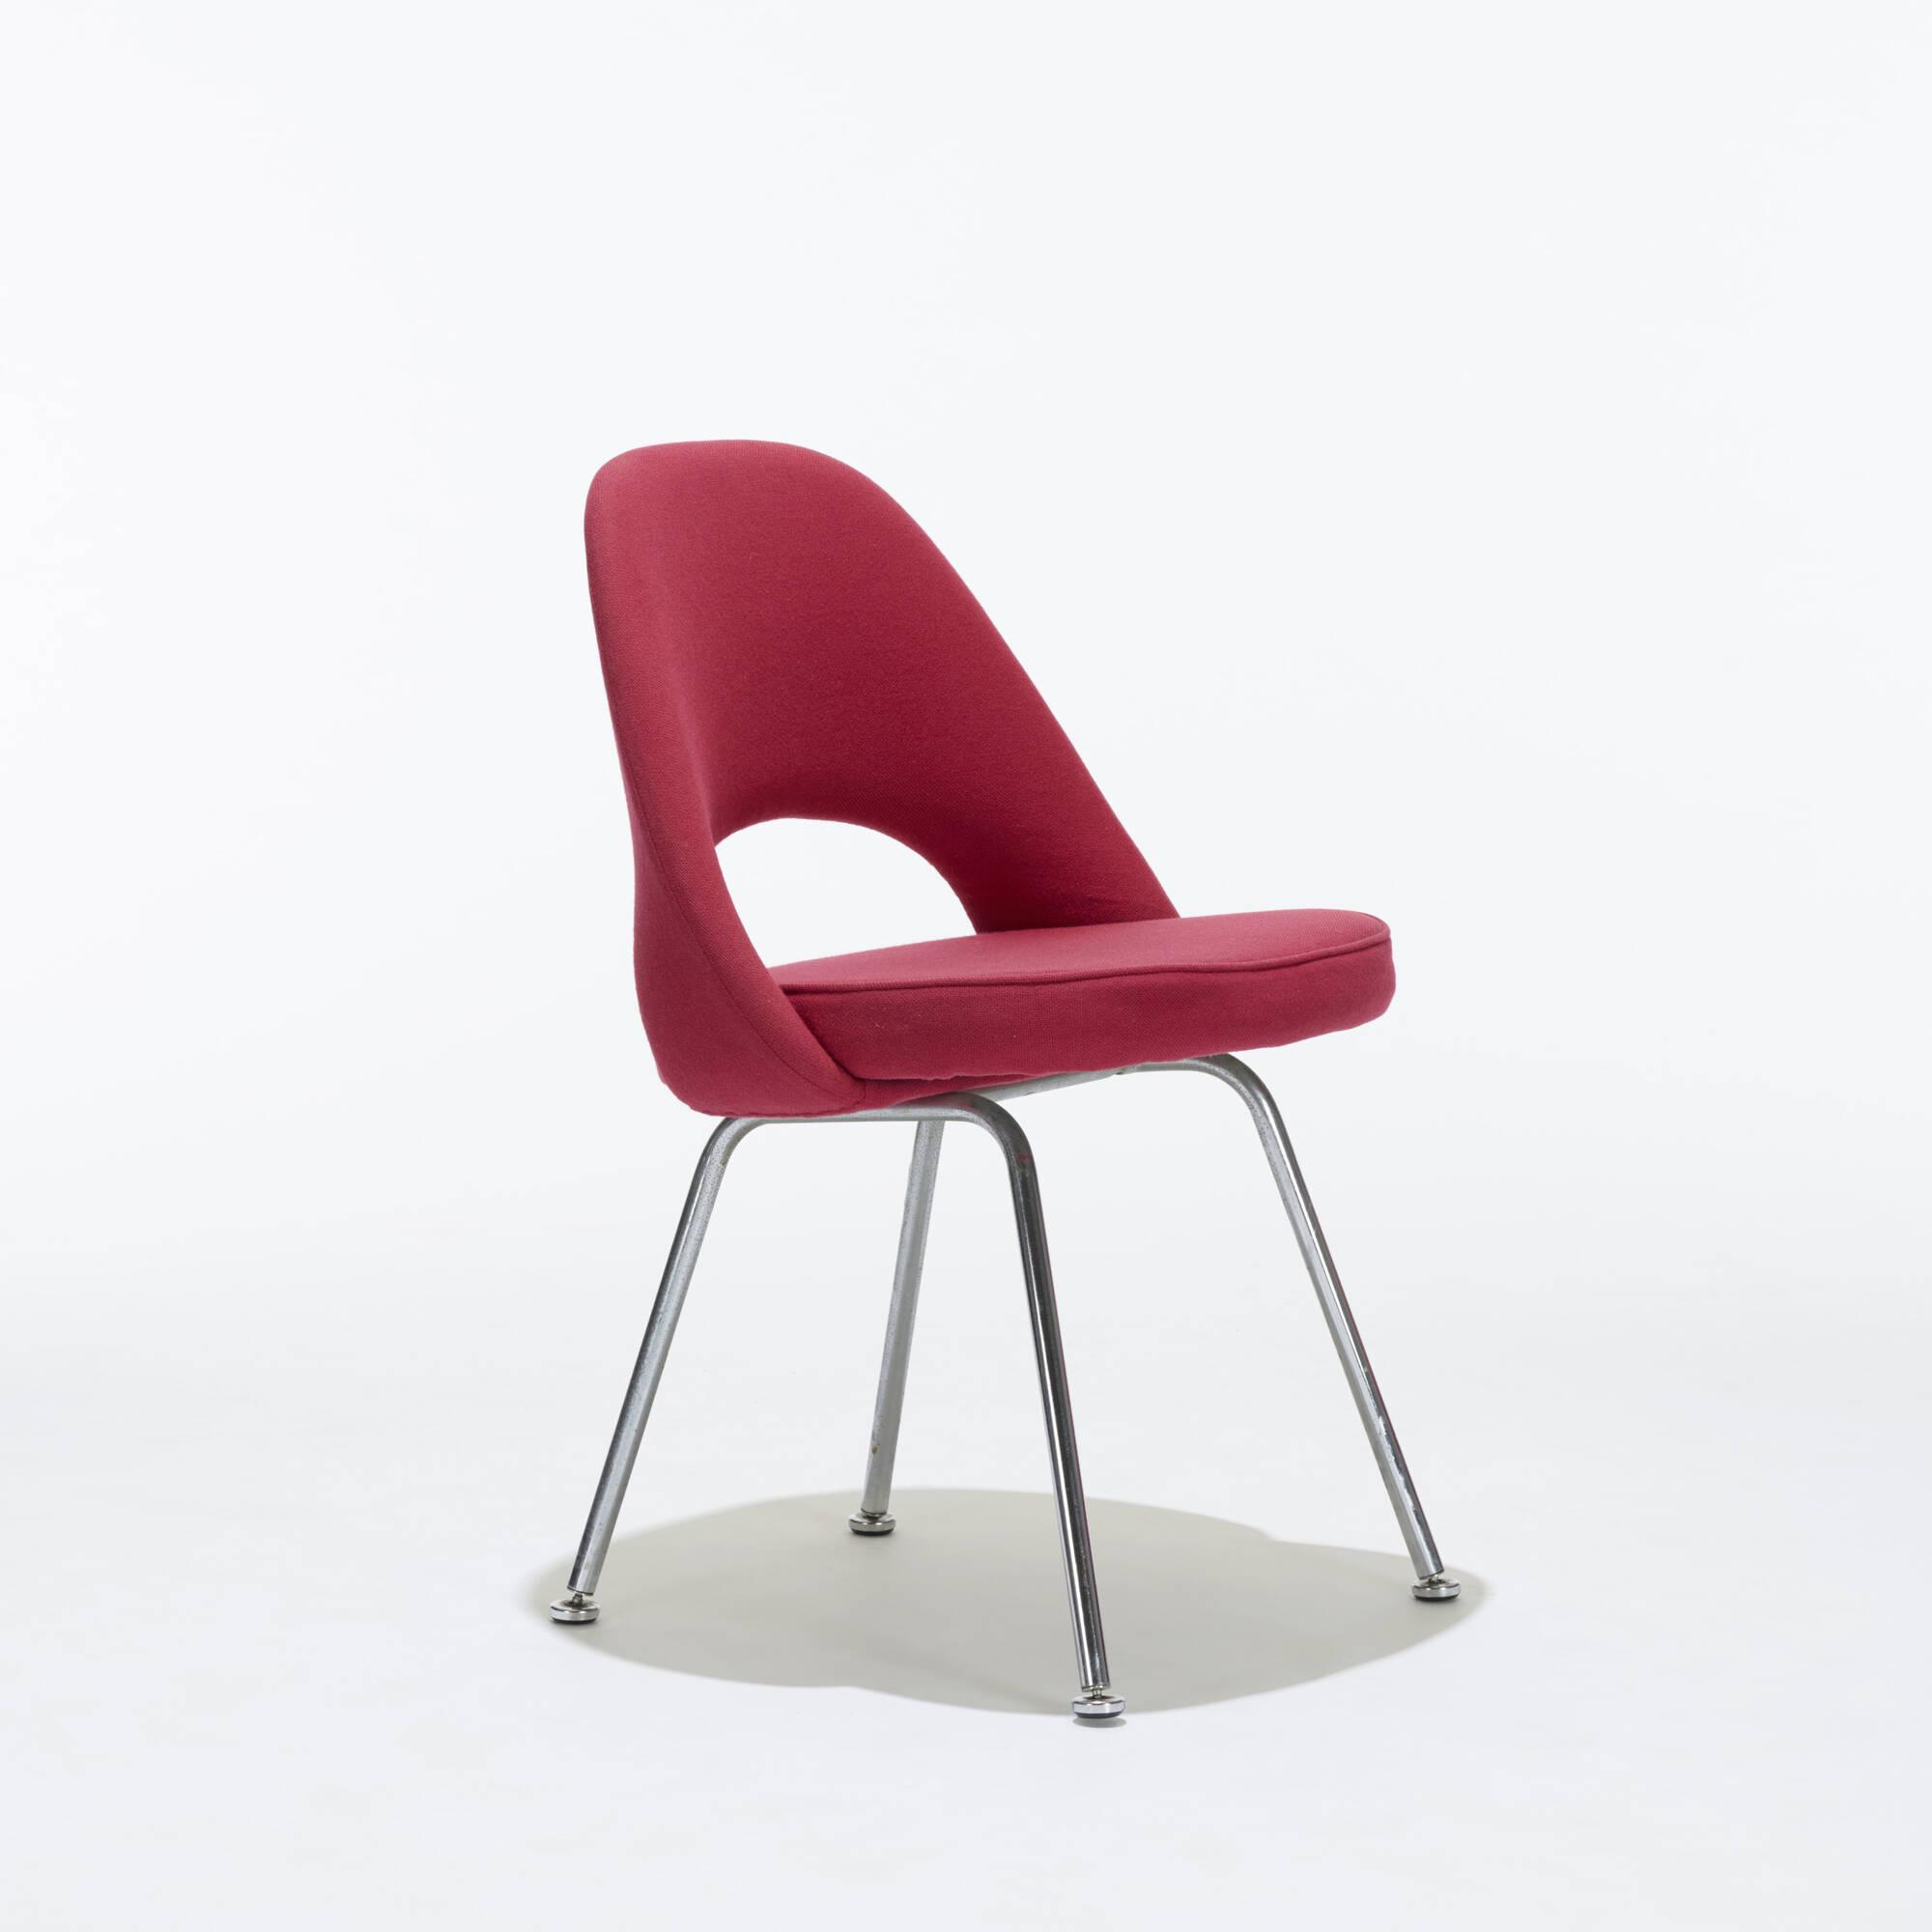 ... 219 Eero Saarinen / dining chairs set of six (3 of 3) & 219: EERO SAARINEN dining chairs set of six u003c American Design 15 ...